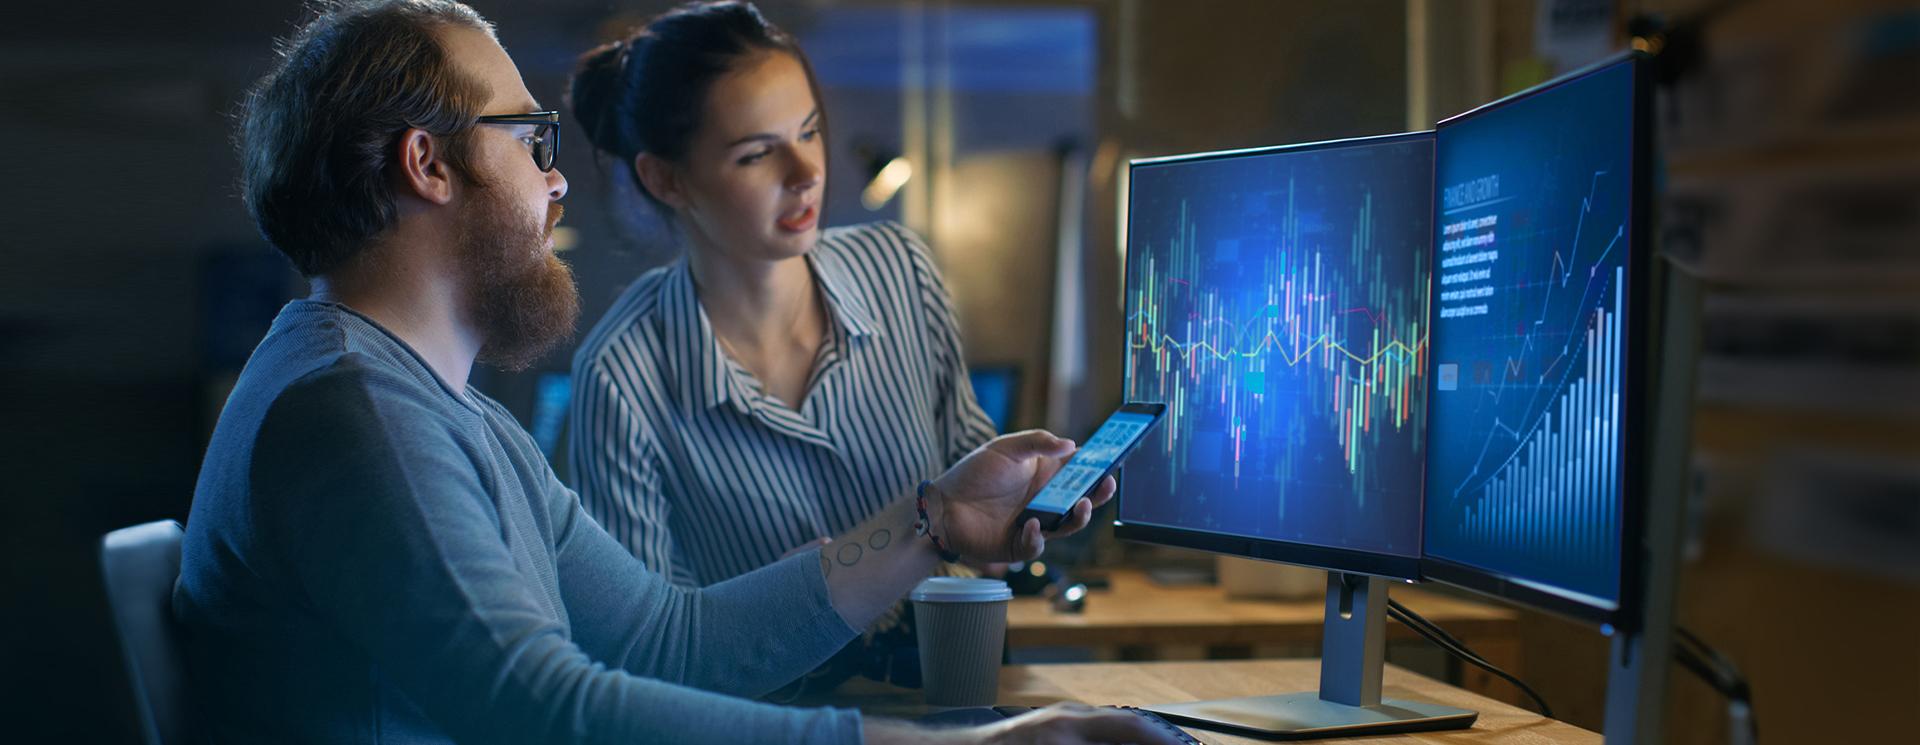 Moneyfarm - Investment Portal image